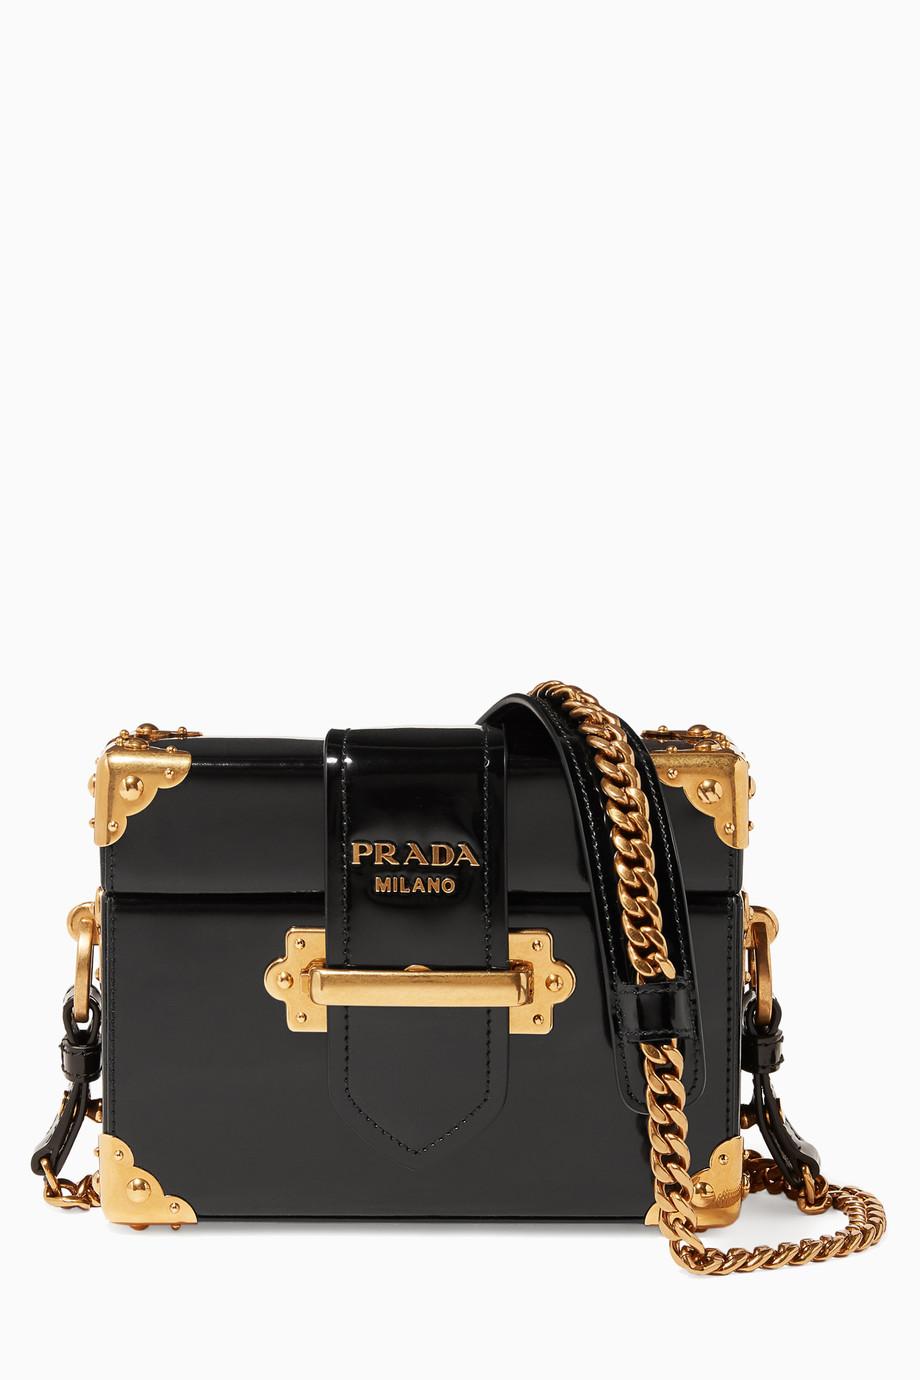 36105aebde3e Shop Prada Black Black Treasure Trunk Box Bag for Women | Ounass Kuwait